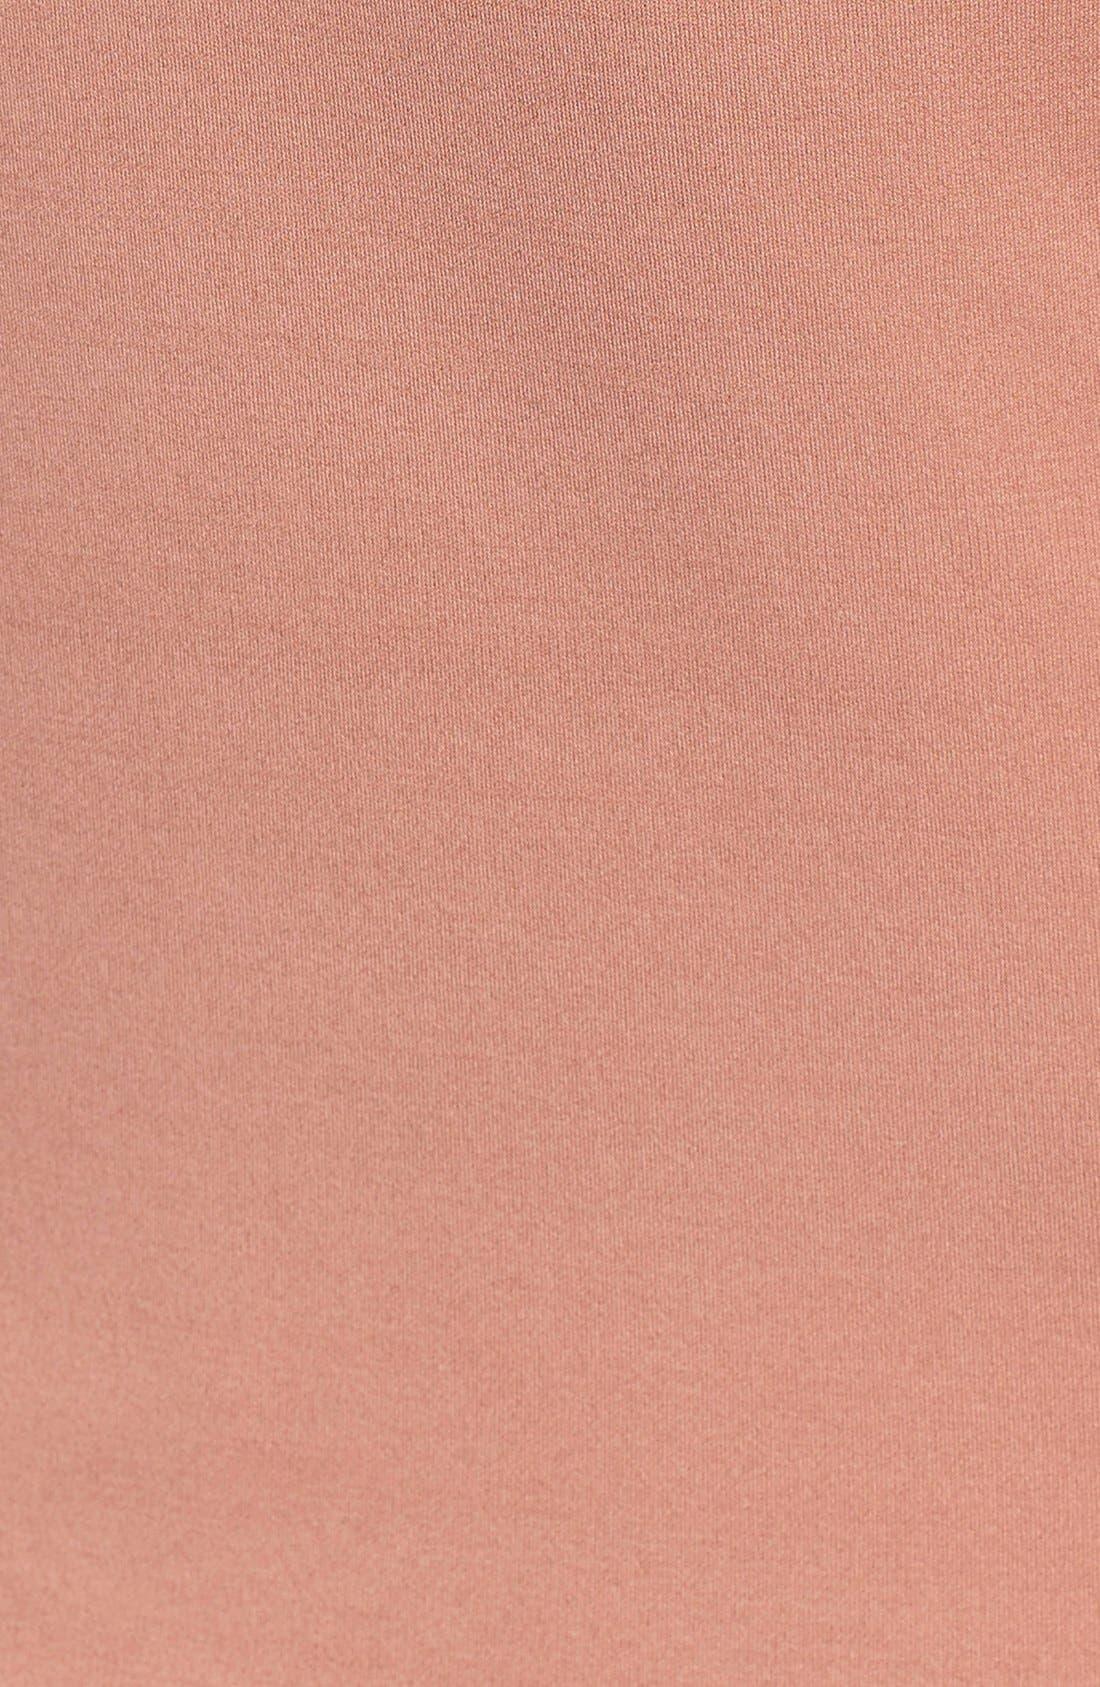 Long Scoop Neck Camisole,                             Alternate thumbnail 118, color,